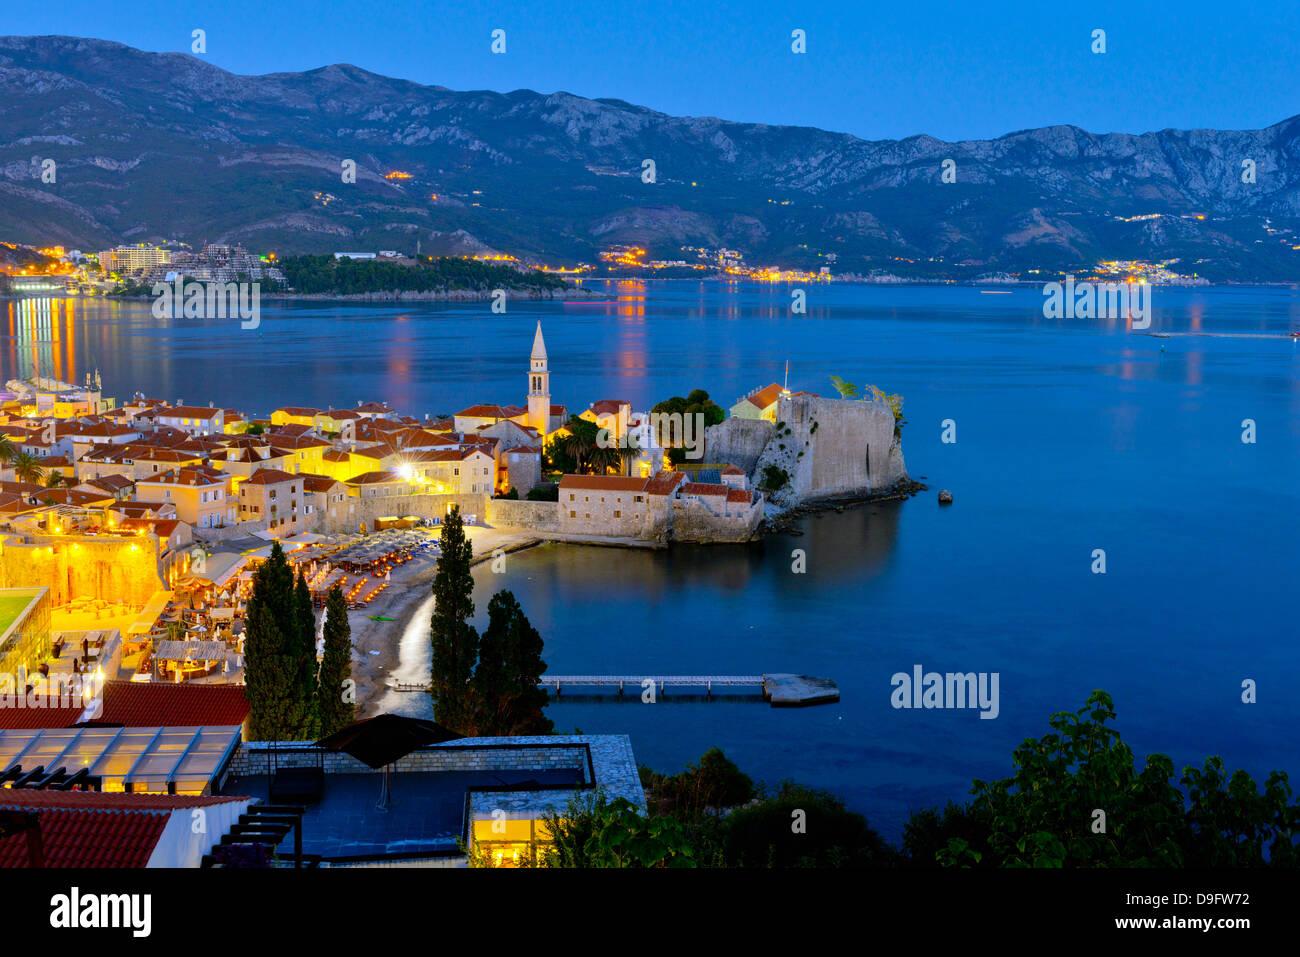 Old Town (Stari Grad), Budva, Montenegro Stock Photo